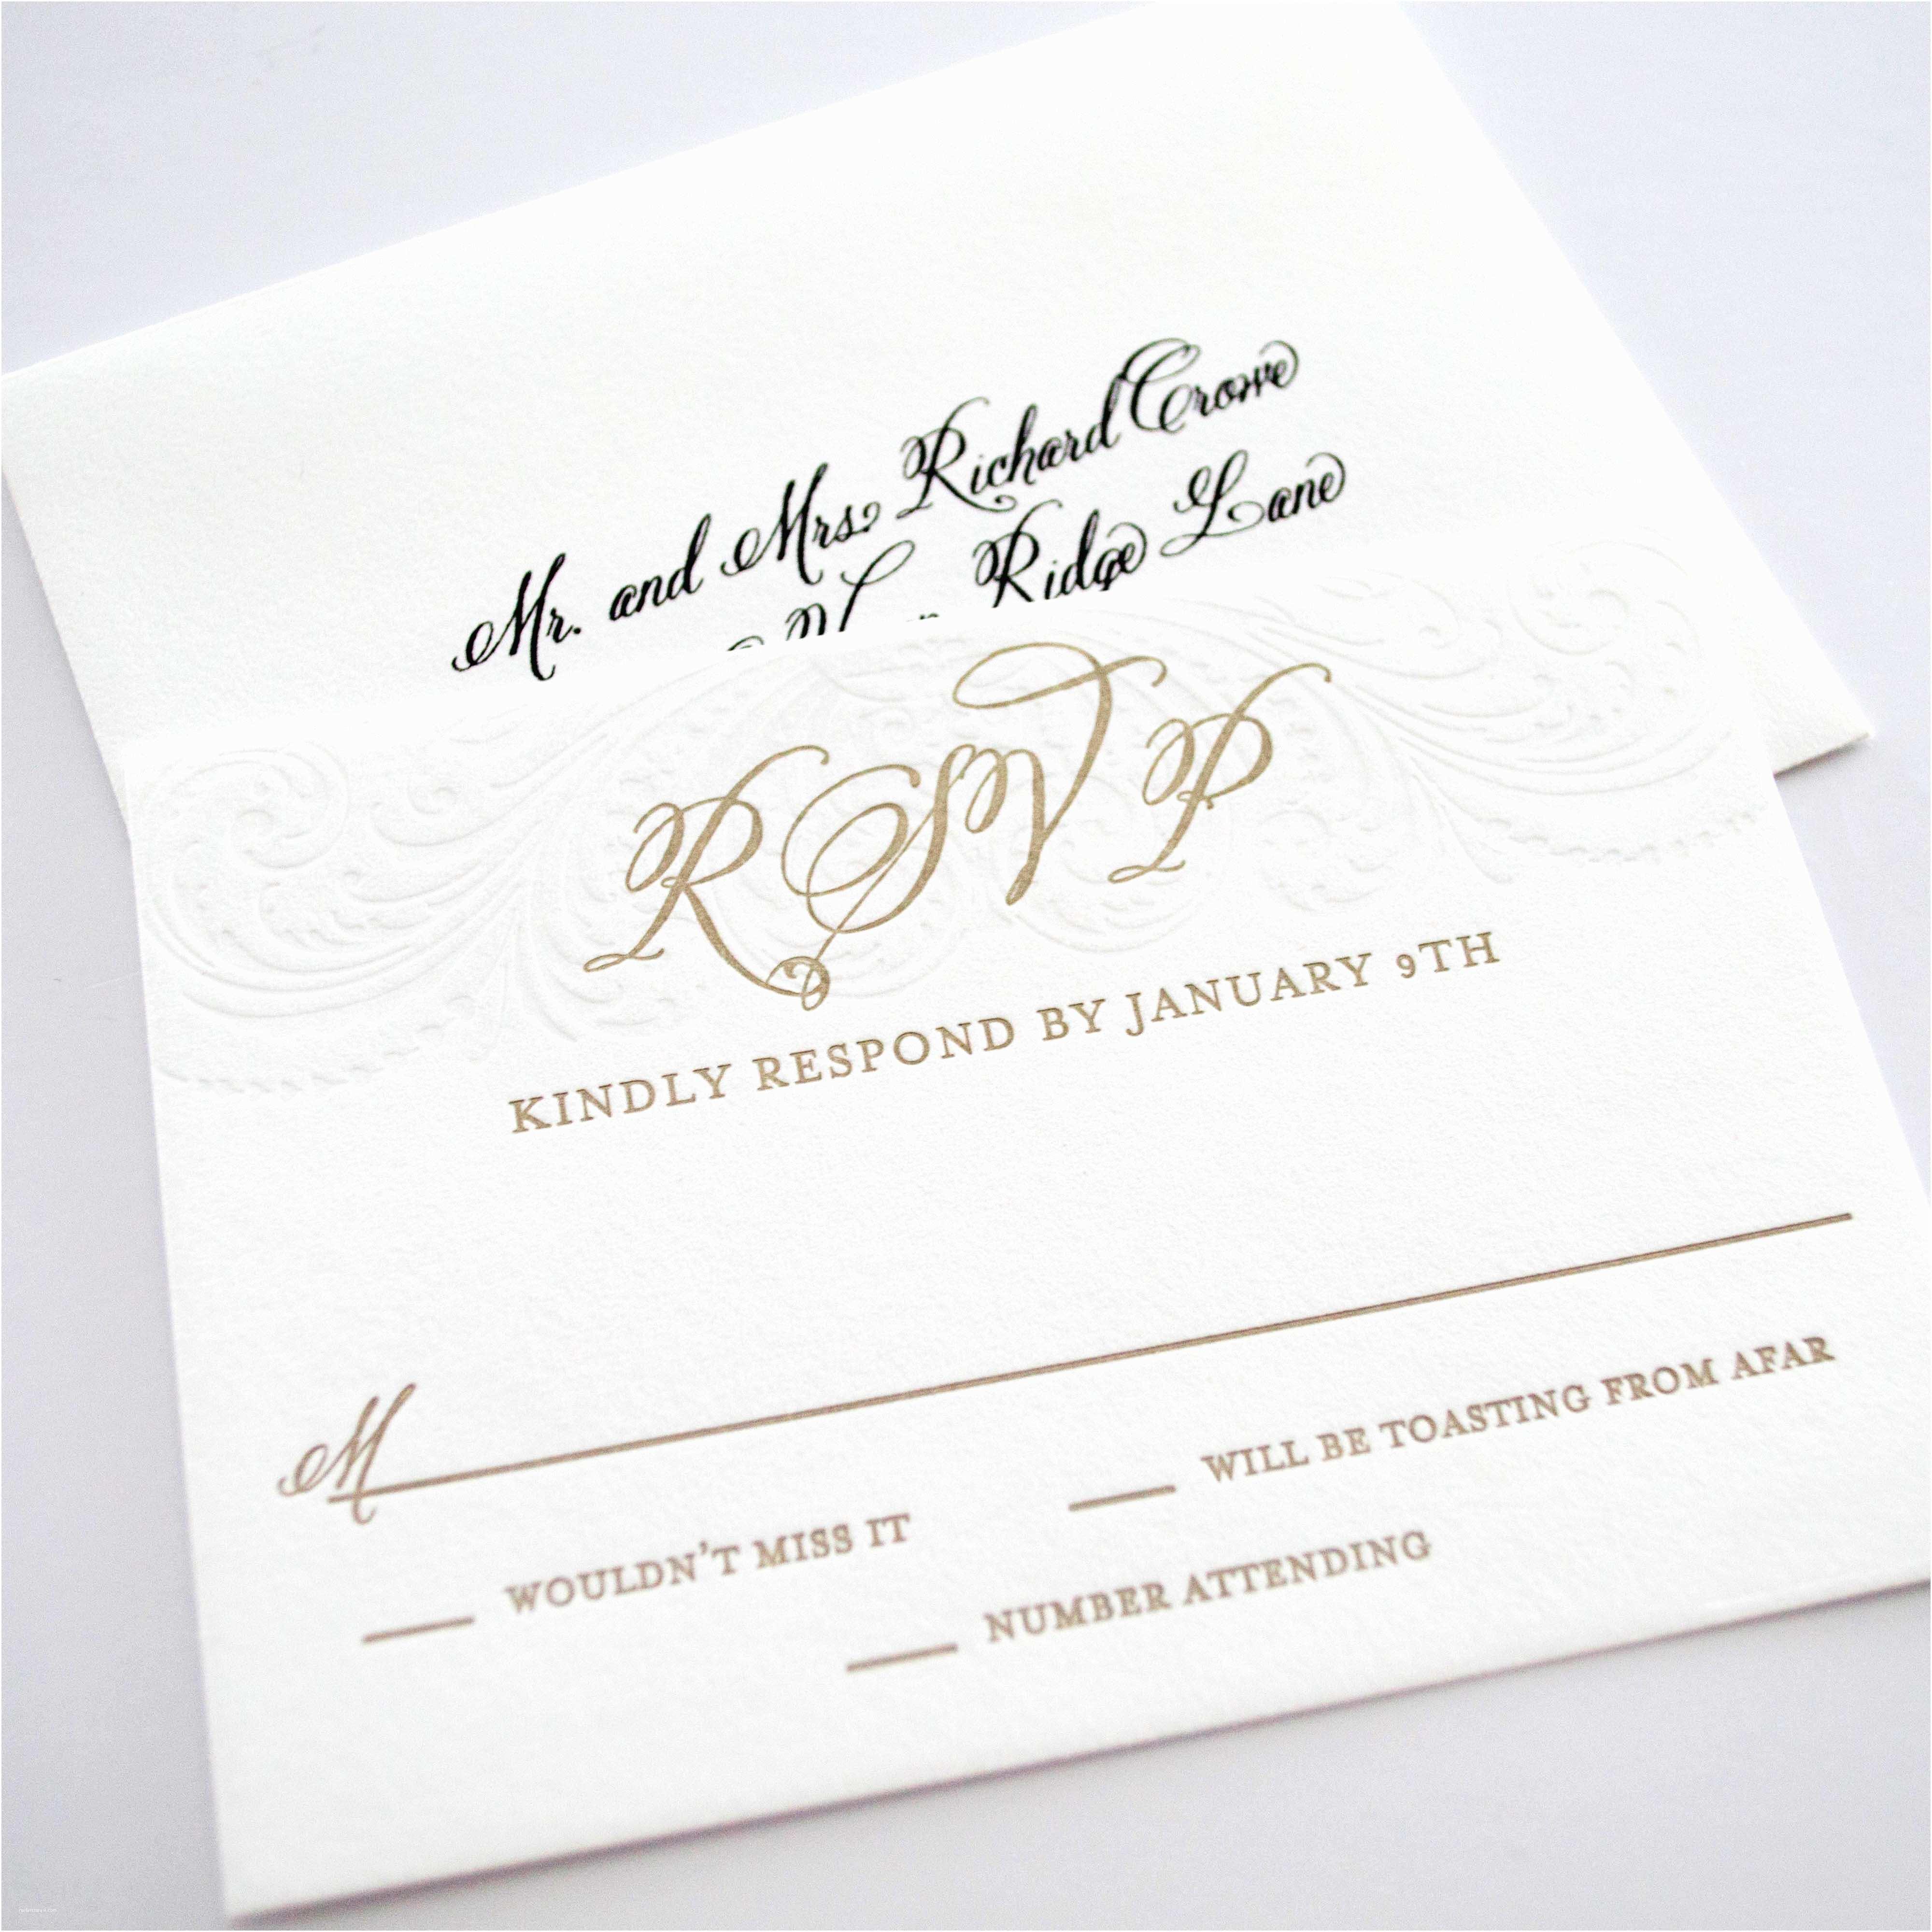 Affordable Letterpress Wedding Invitations Affordable Letterpress Wedding Invitations